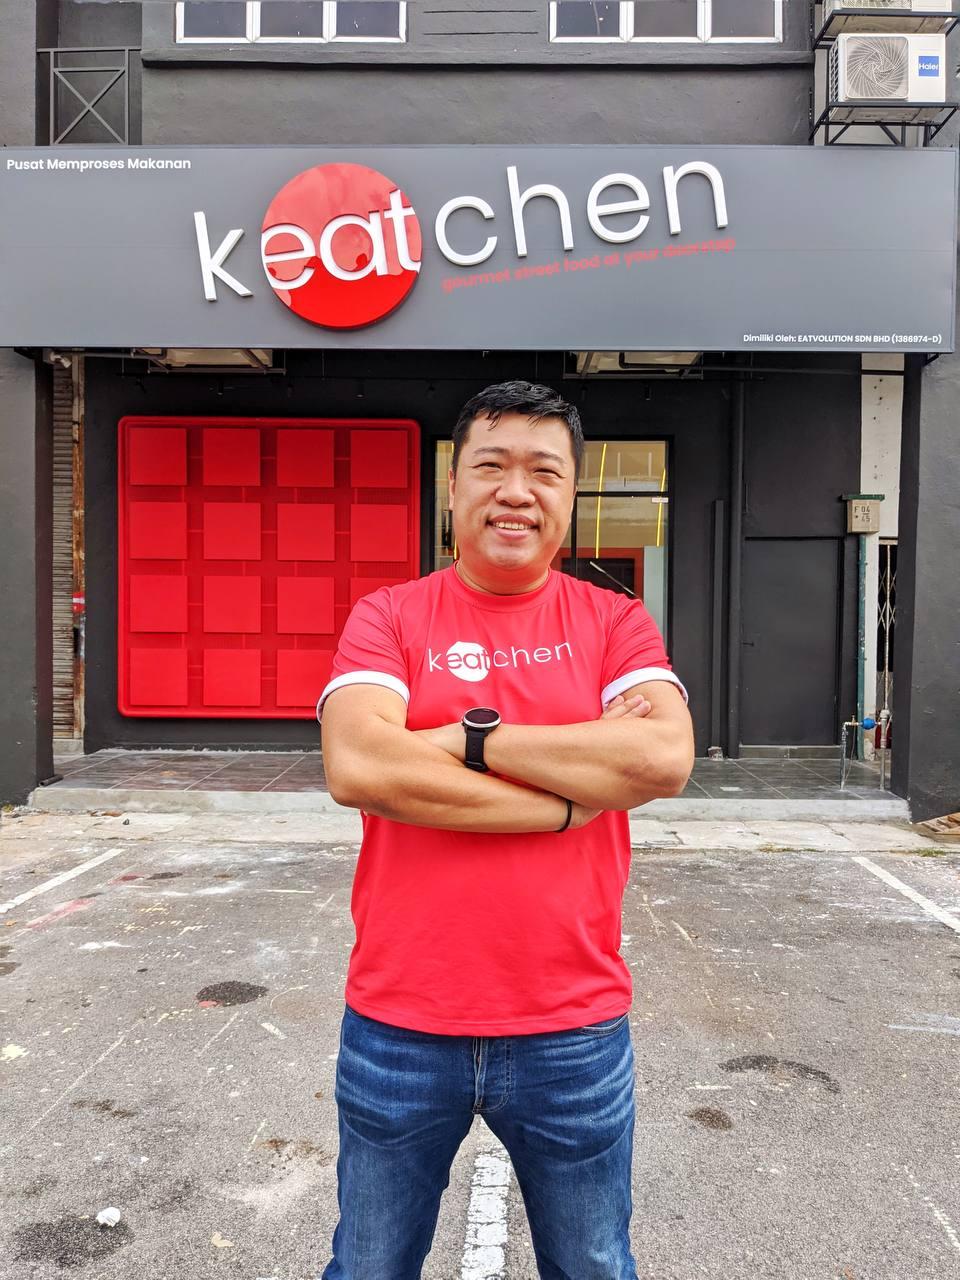 kEATchen - Memartabatkan nostalgia sajian culinary champions di era digital